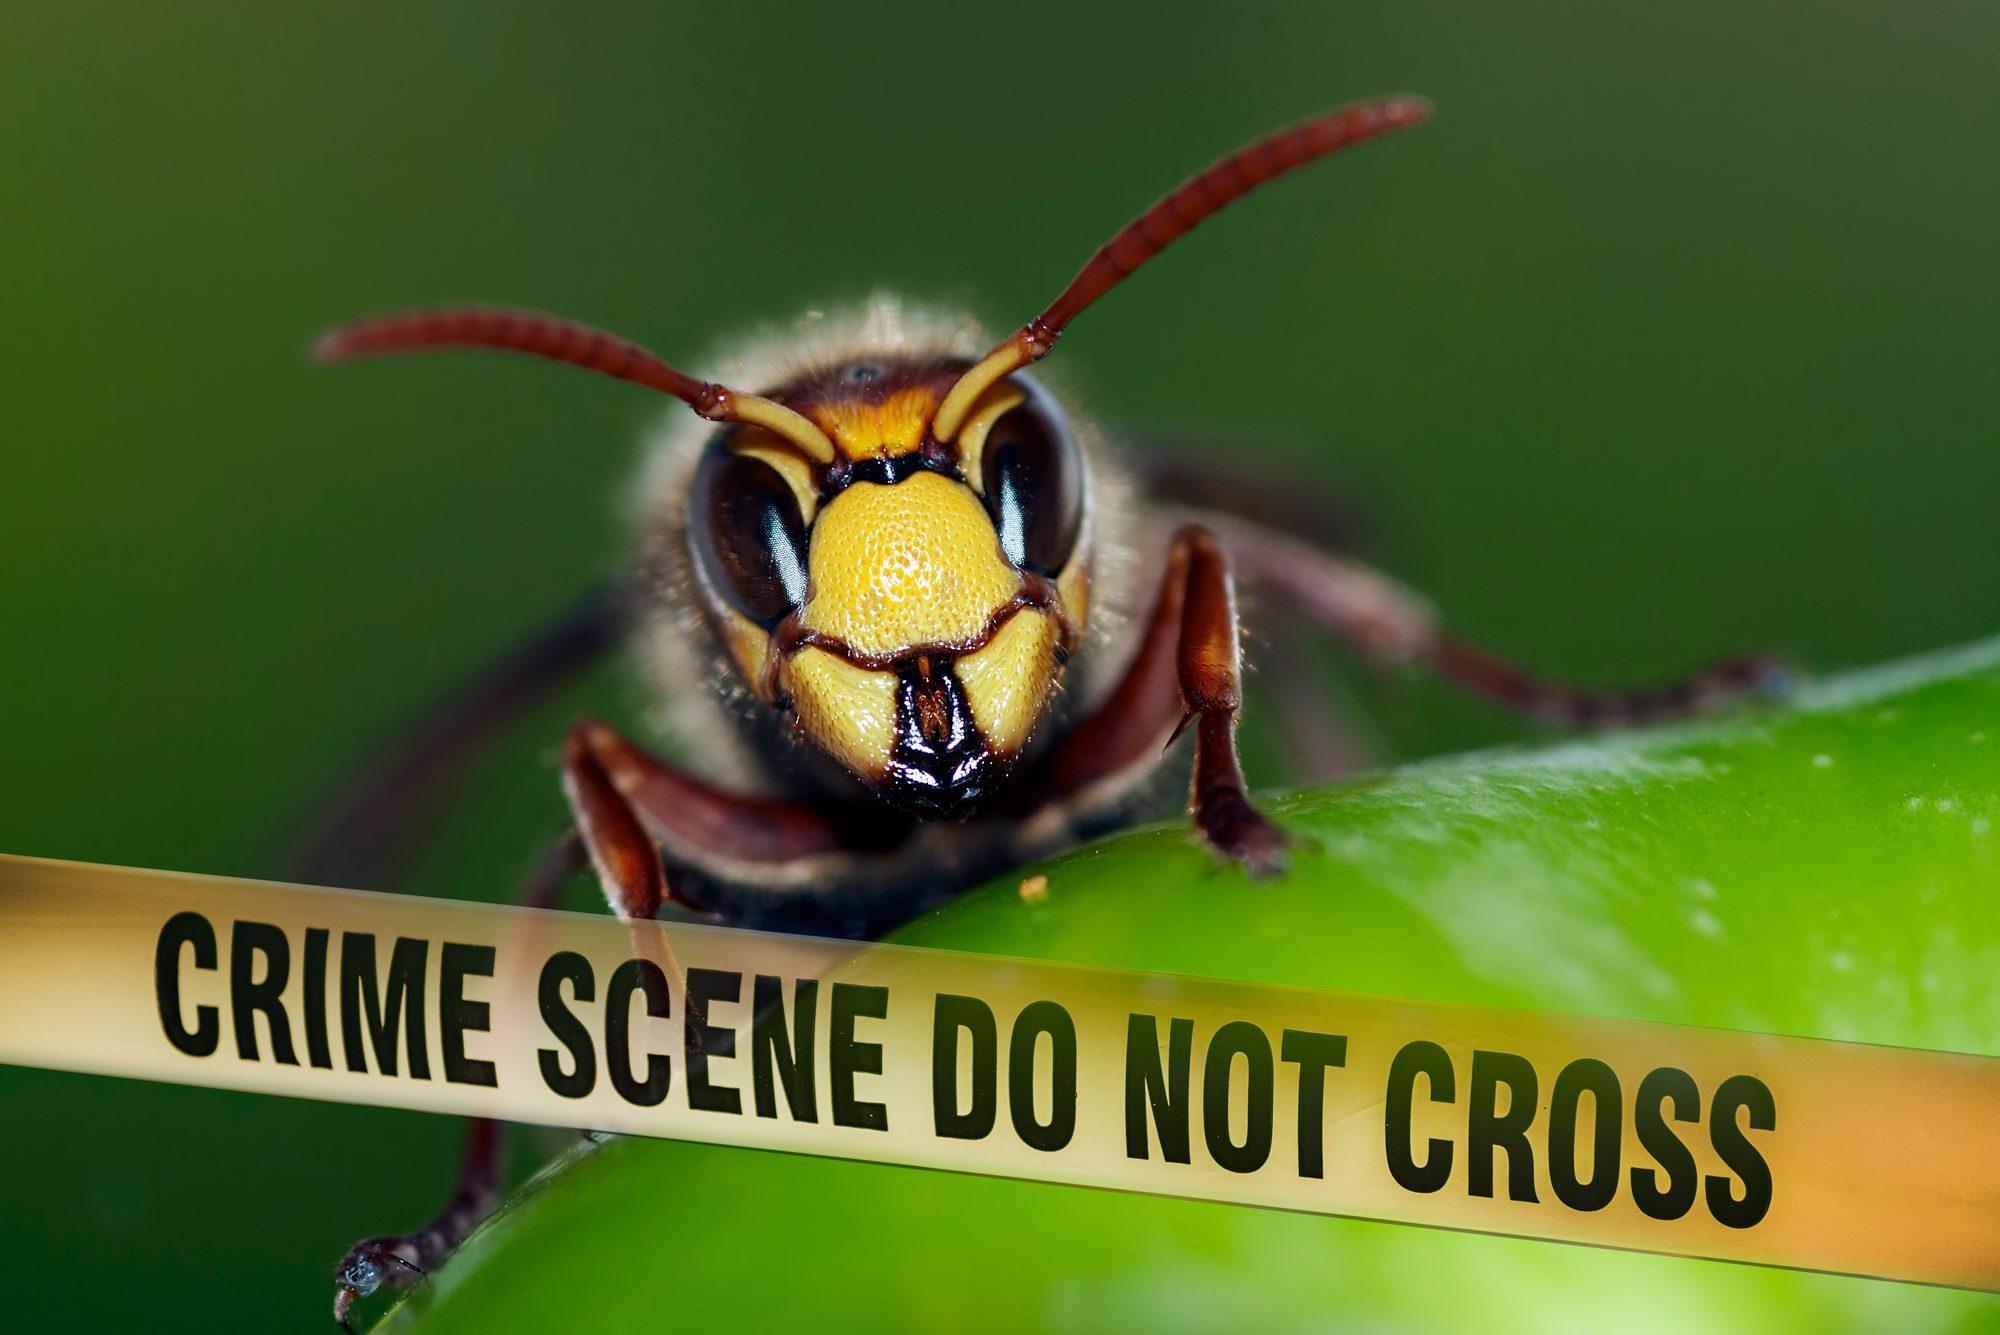 Episode 2: Murder Hornets!